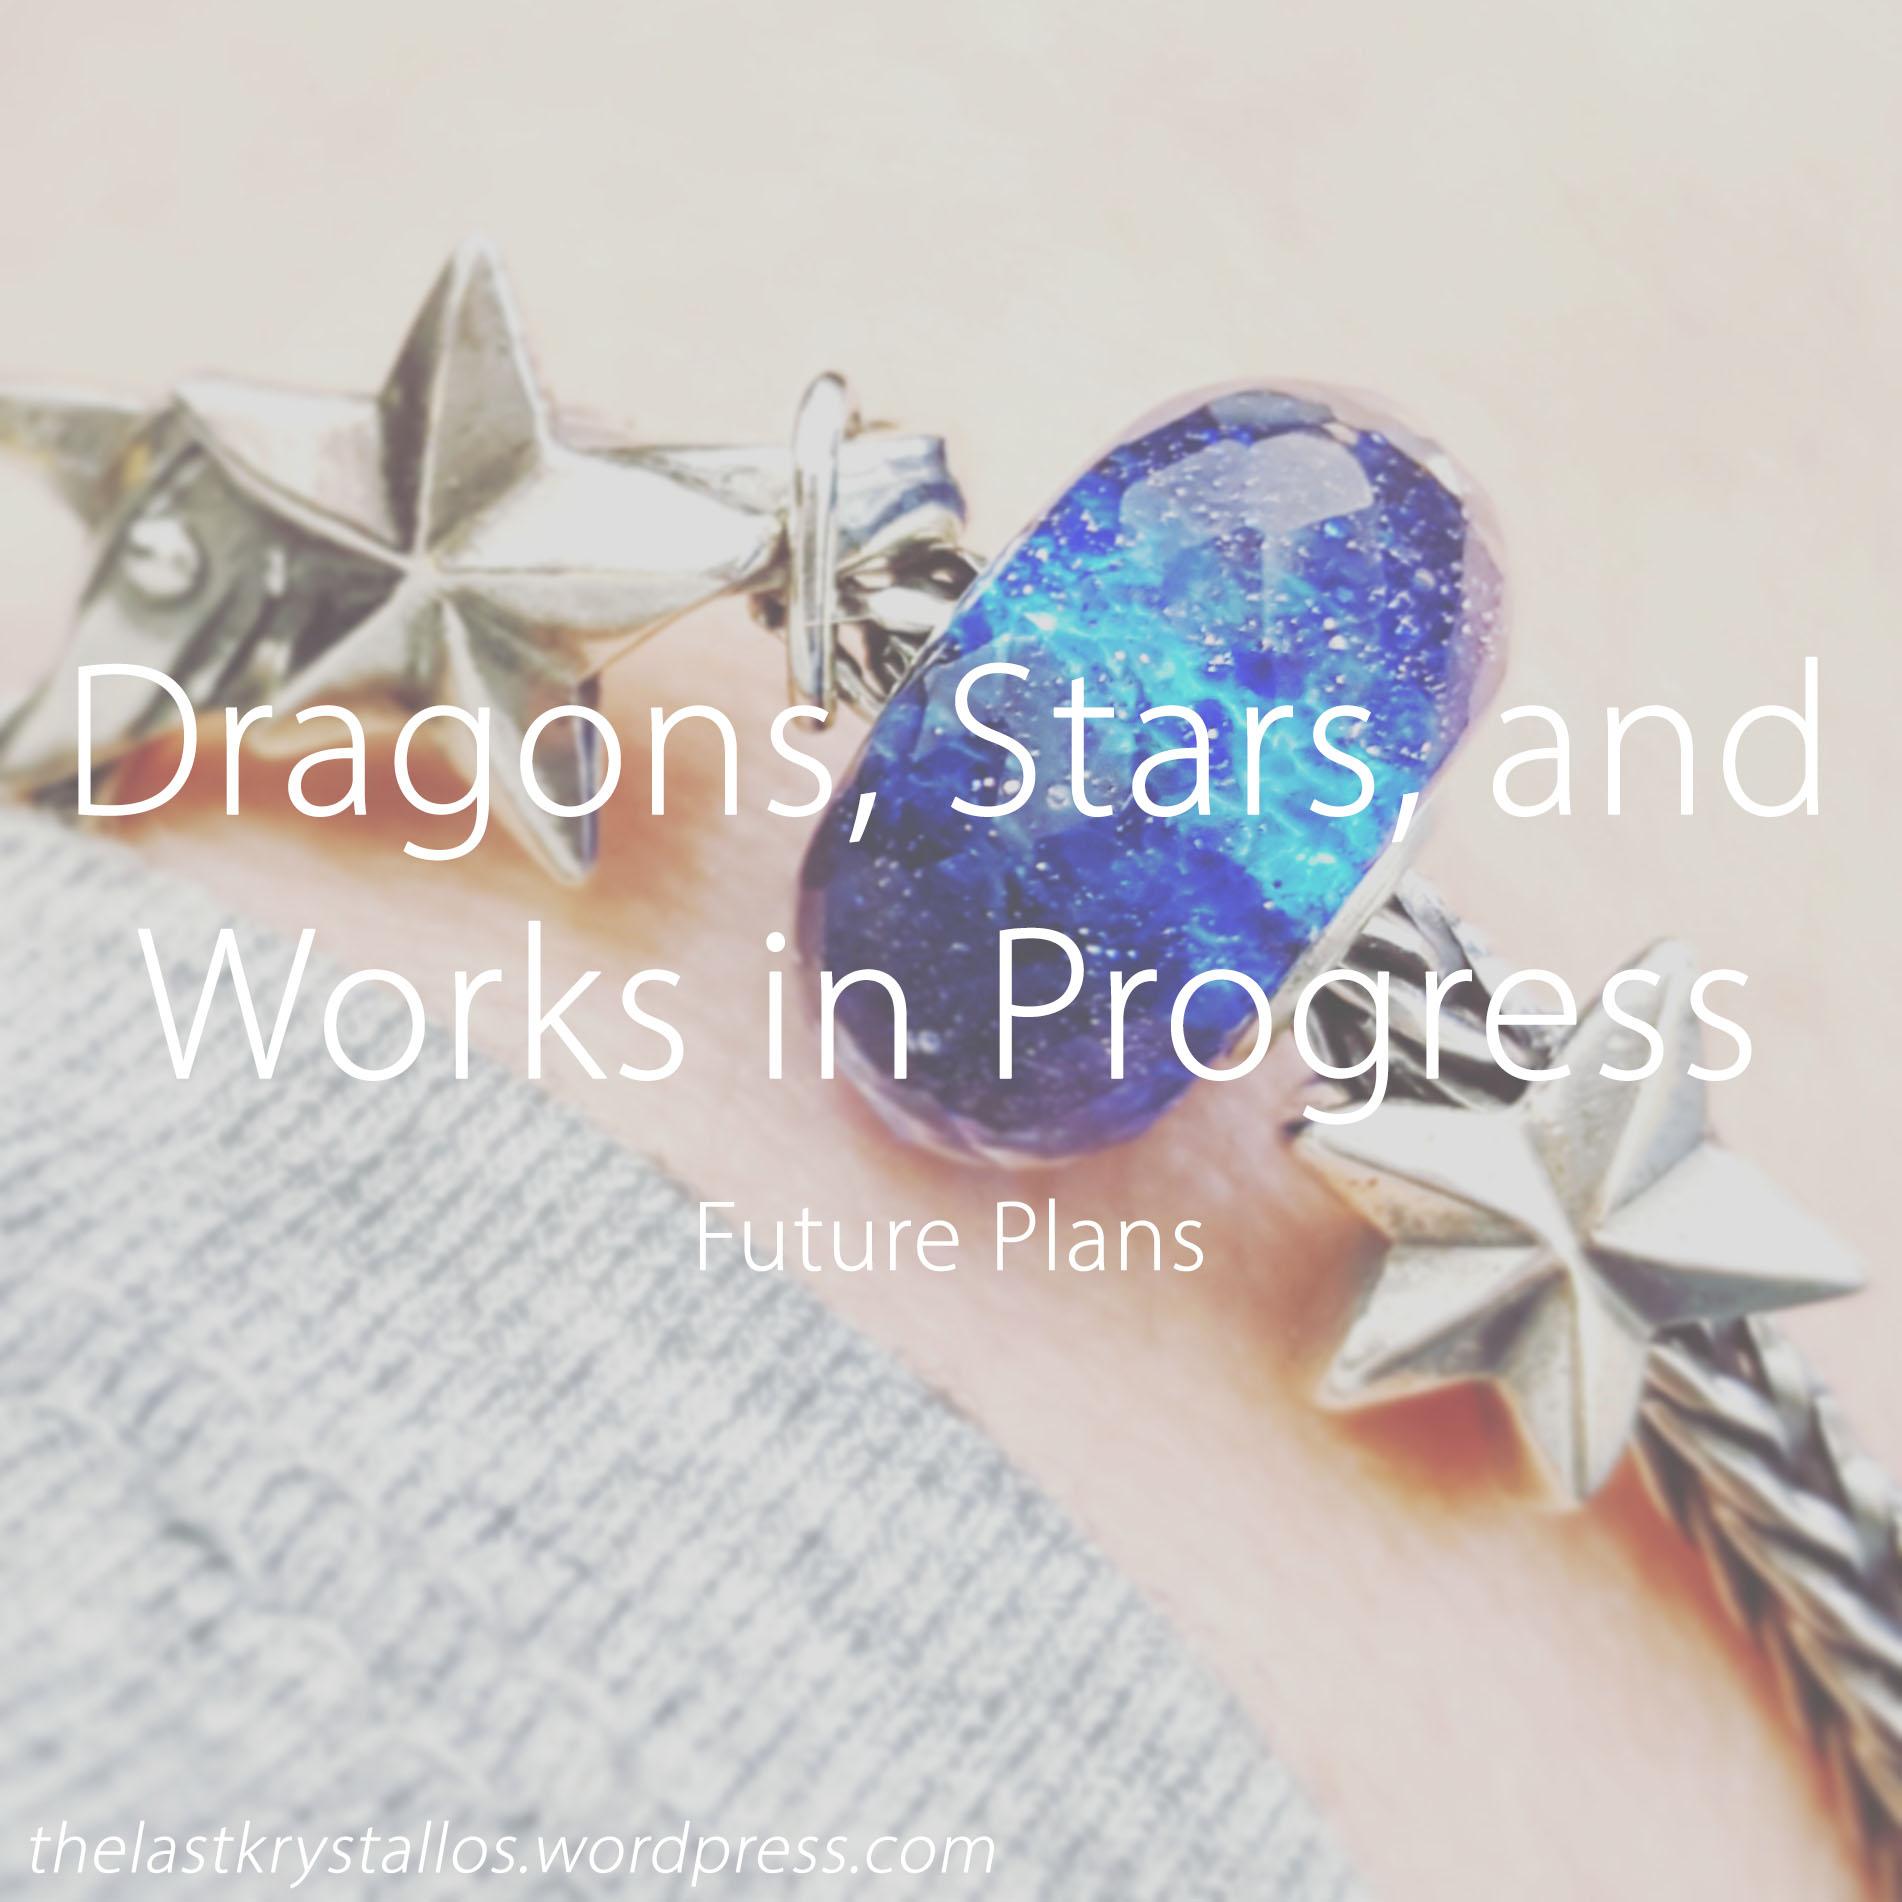 Dragons, Stars, and Works in Progress - The Last Krystallos